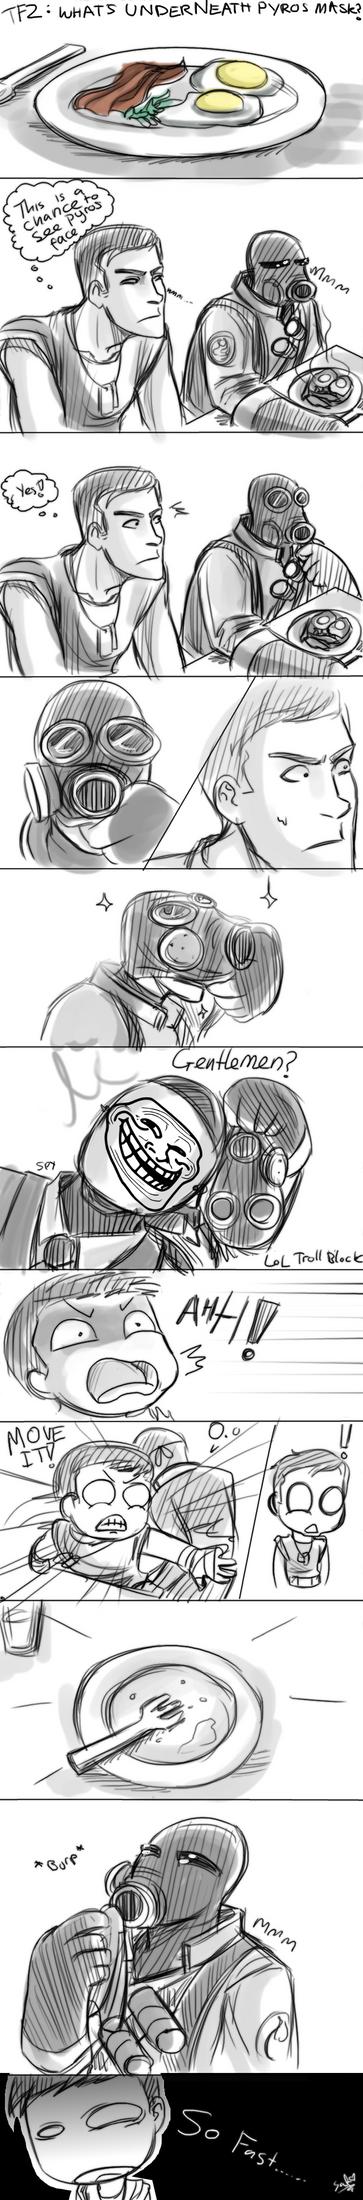 TF2: whats underneath pyros mask? by DarkLitria